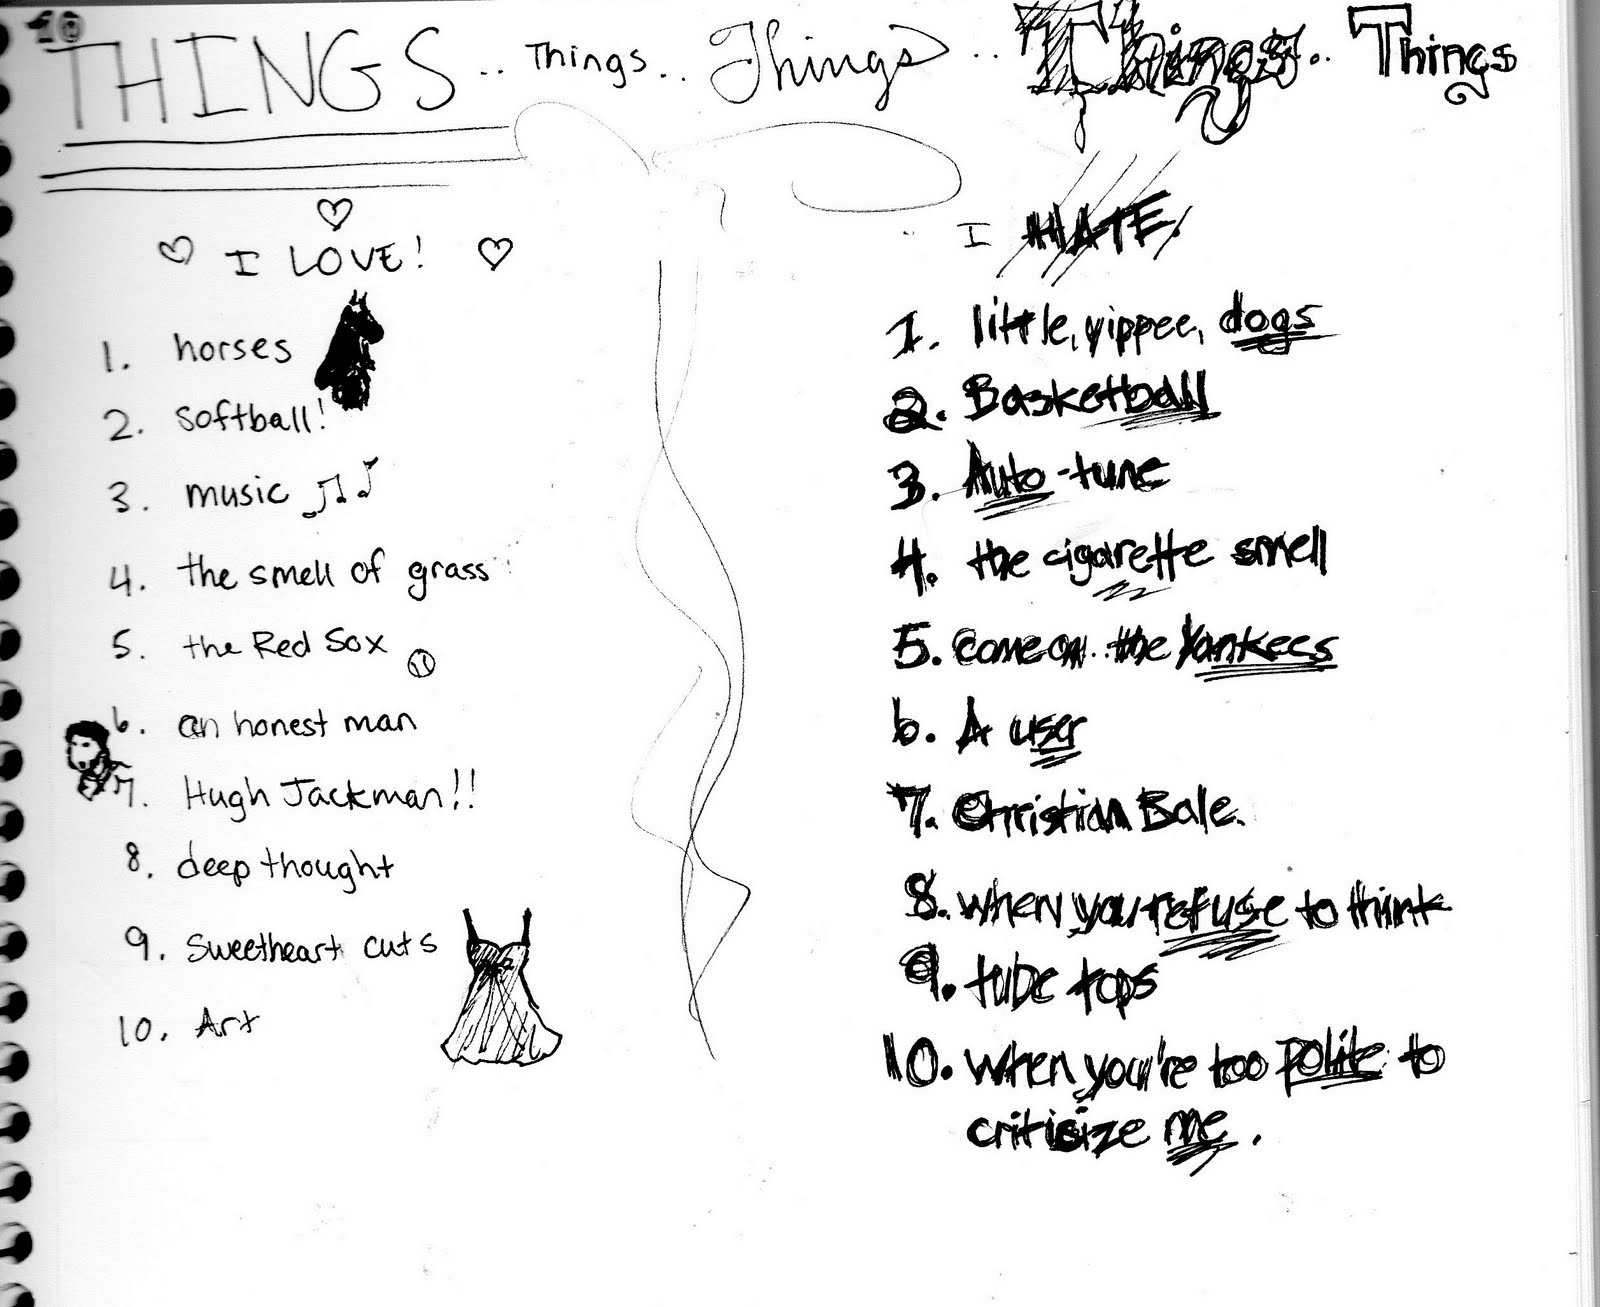 If You Like Stuff Sketchbook 10 Things I Hate And Love